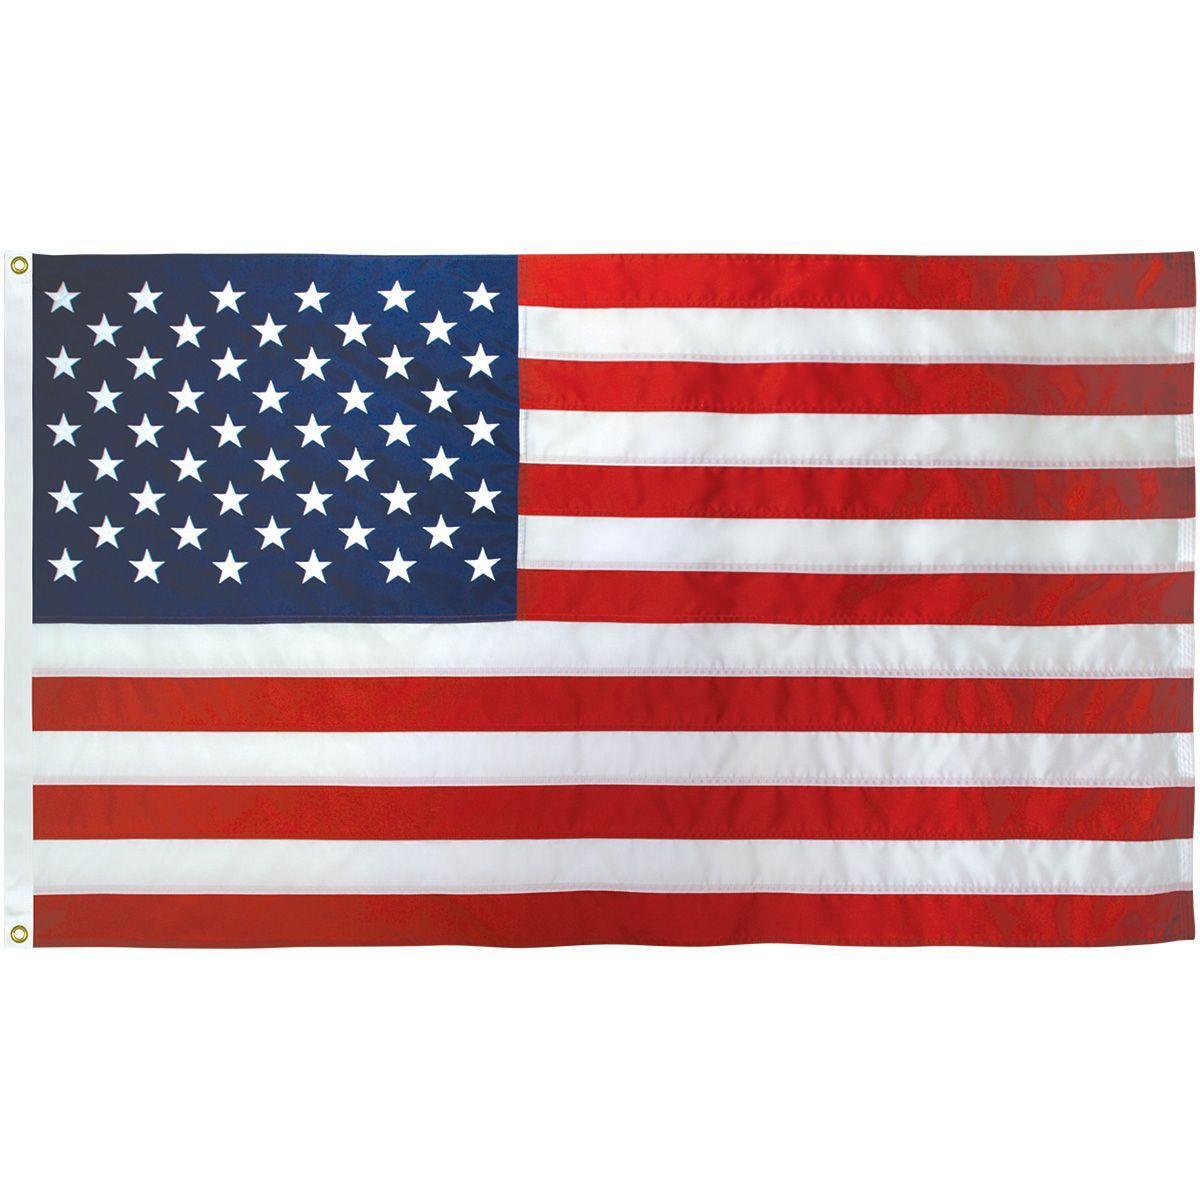 9f3c88e1c723 American Flags - US-Made Premium Quality Guaranteed to Last!